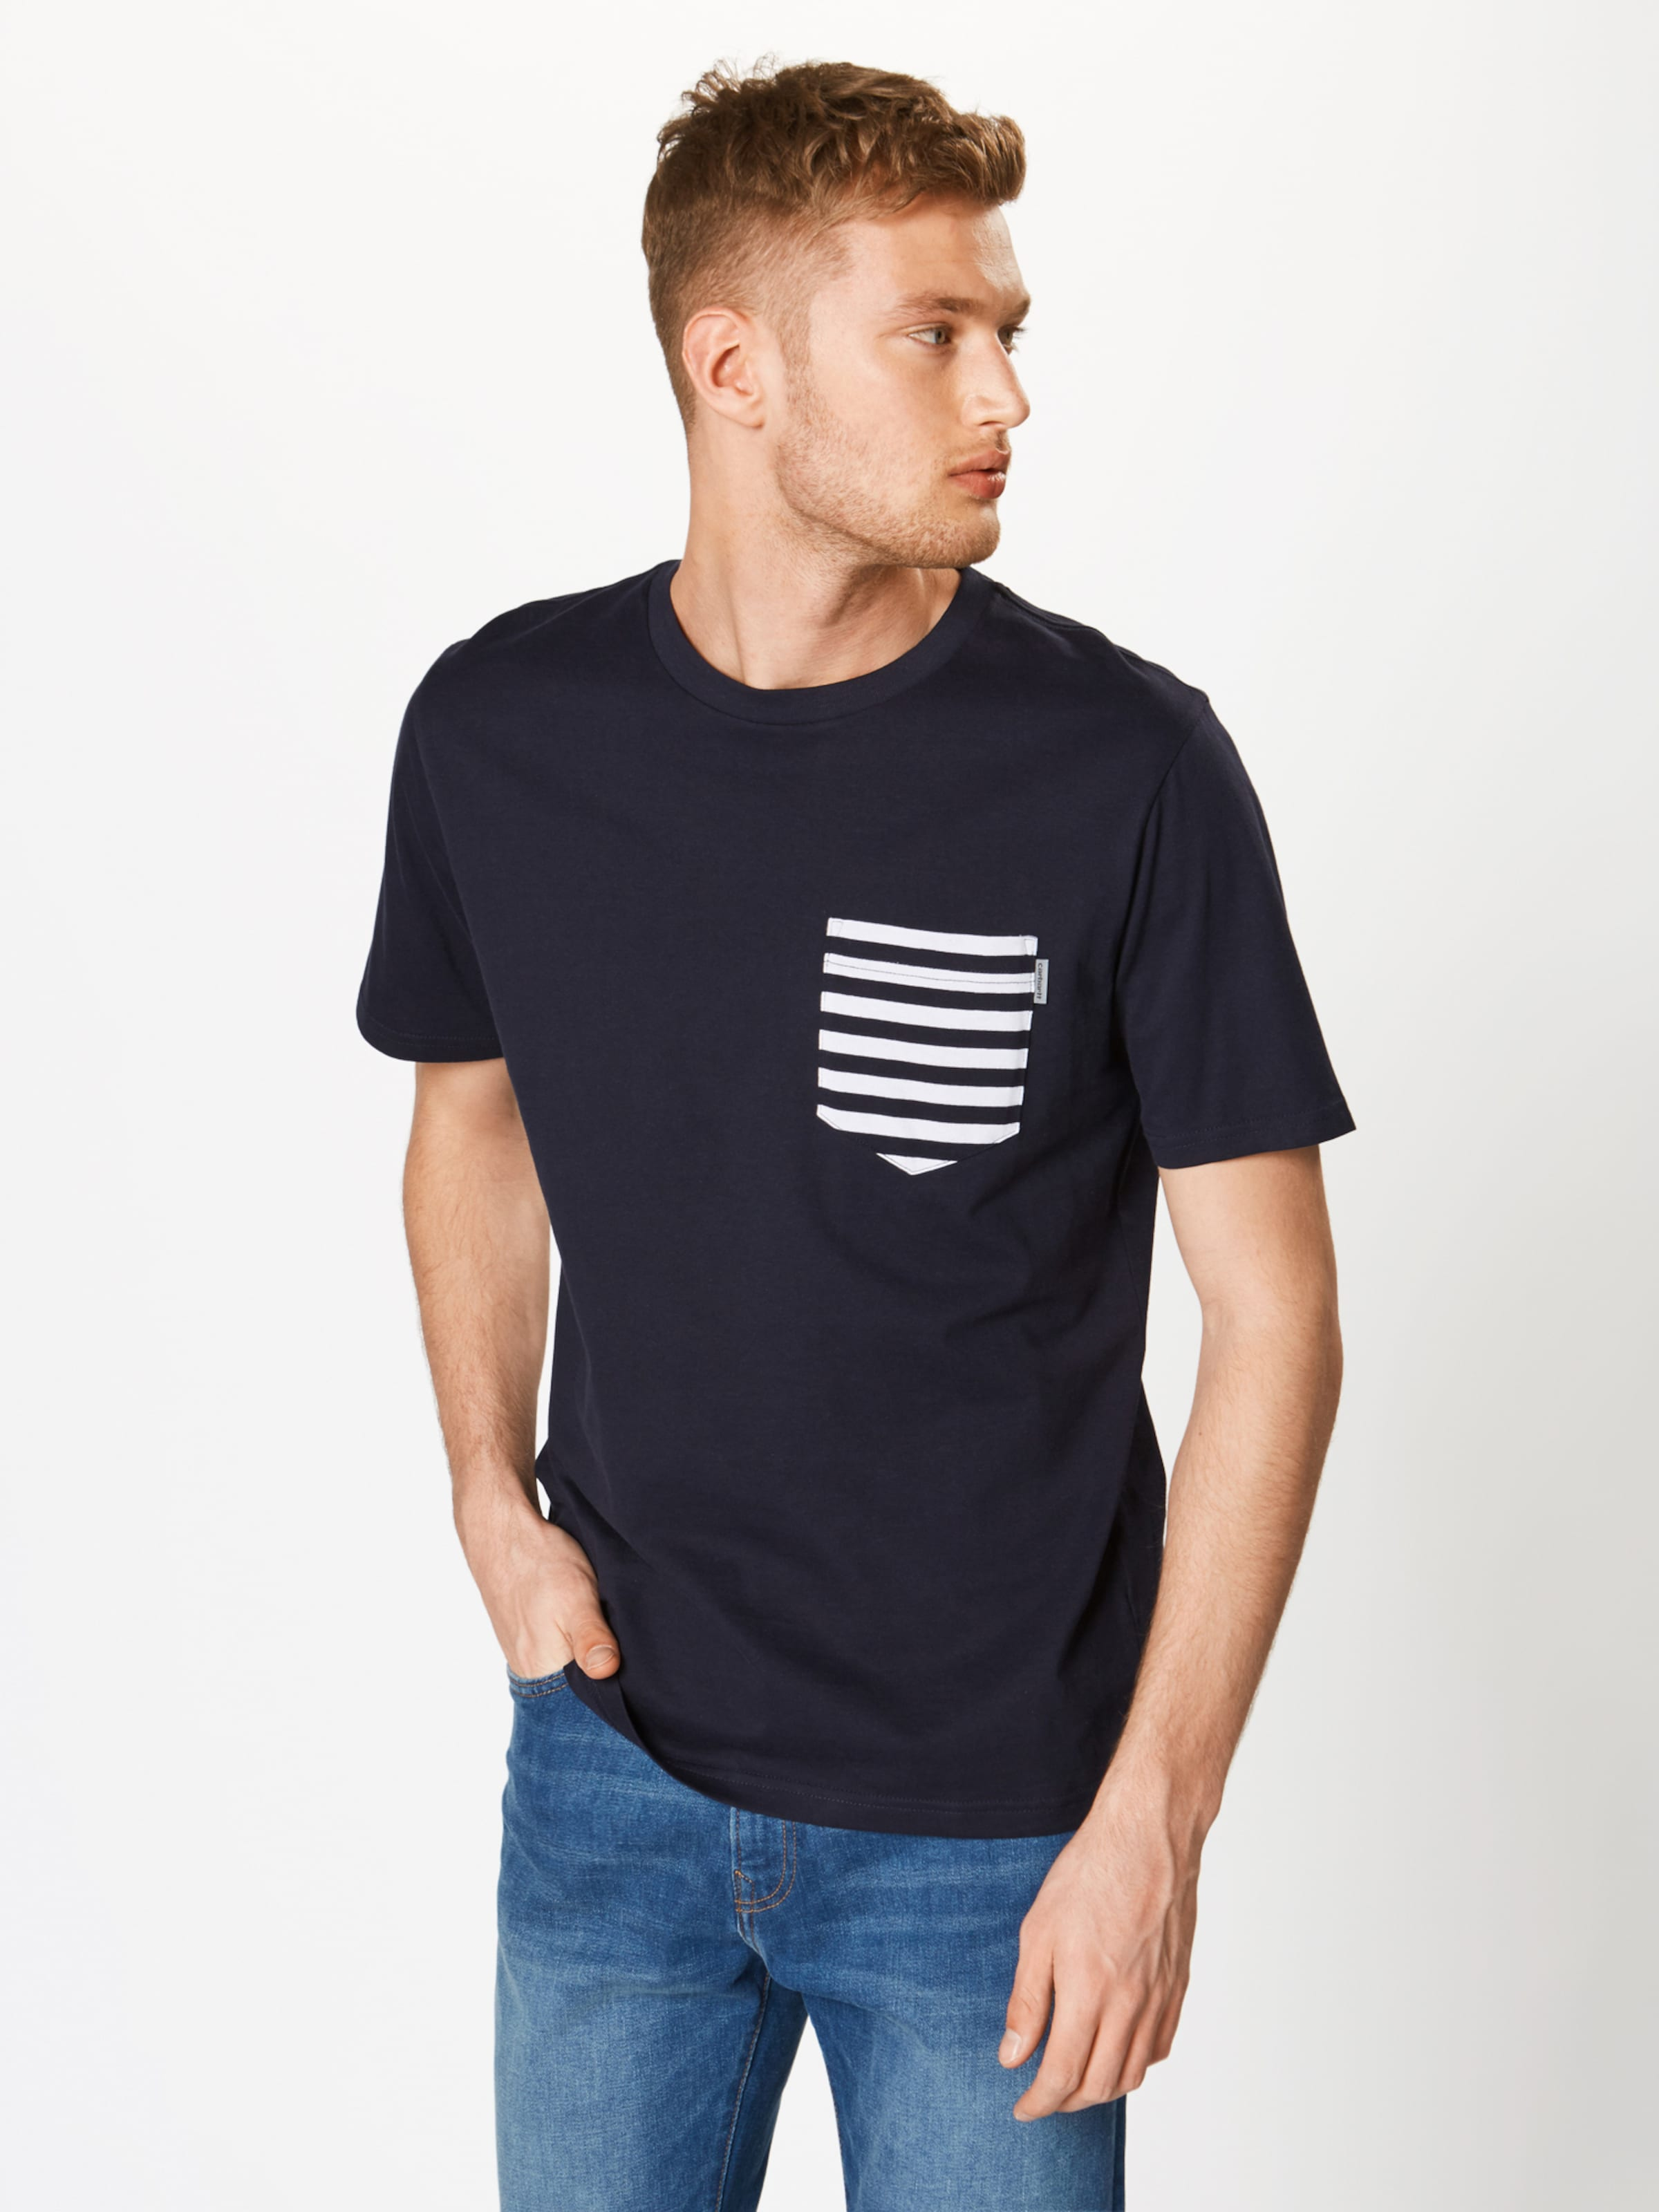 T 'contrast NavyWeiß shirt Carhartt Pocket' In Wip 9Y2bEDHIeW